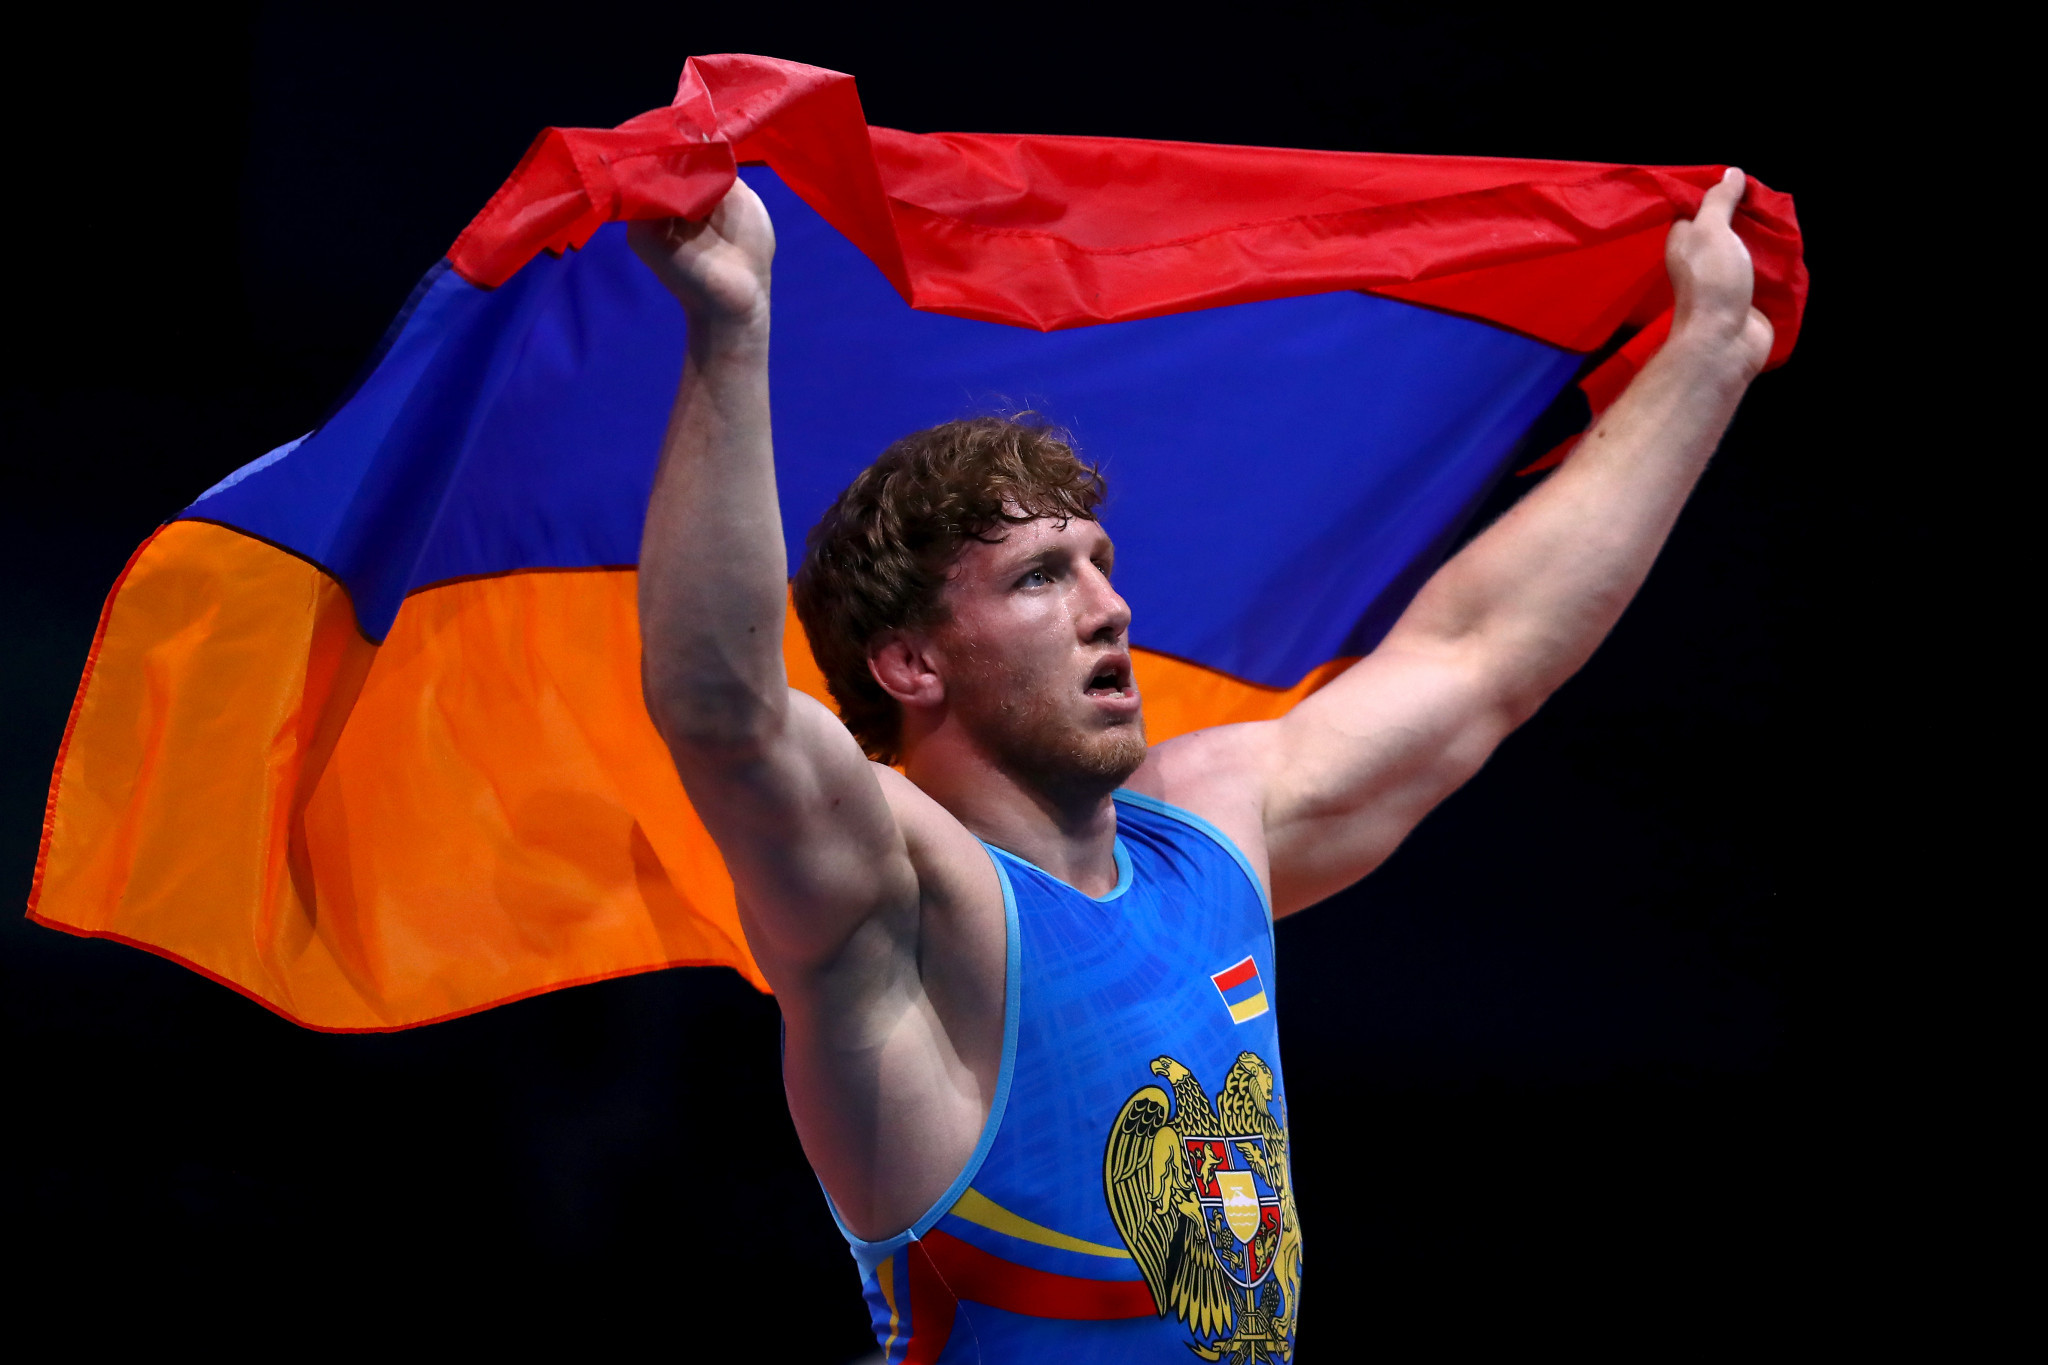 Armenia claim two Greco-Roman titles on day three of European Wrestling Championships